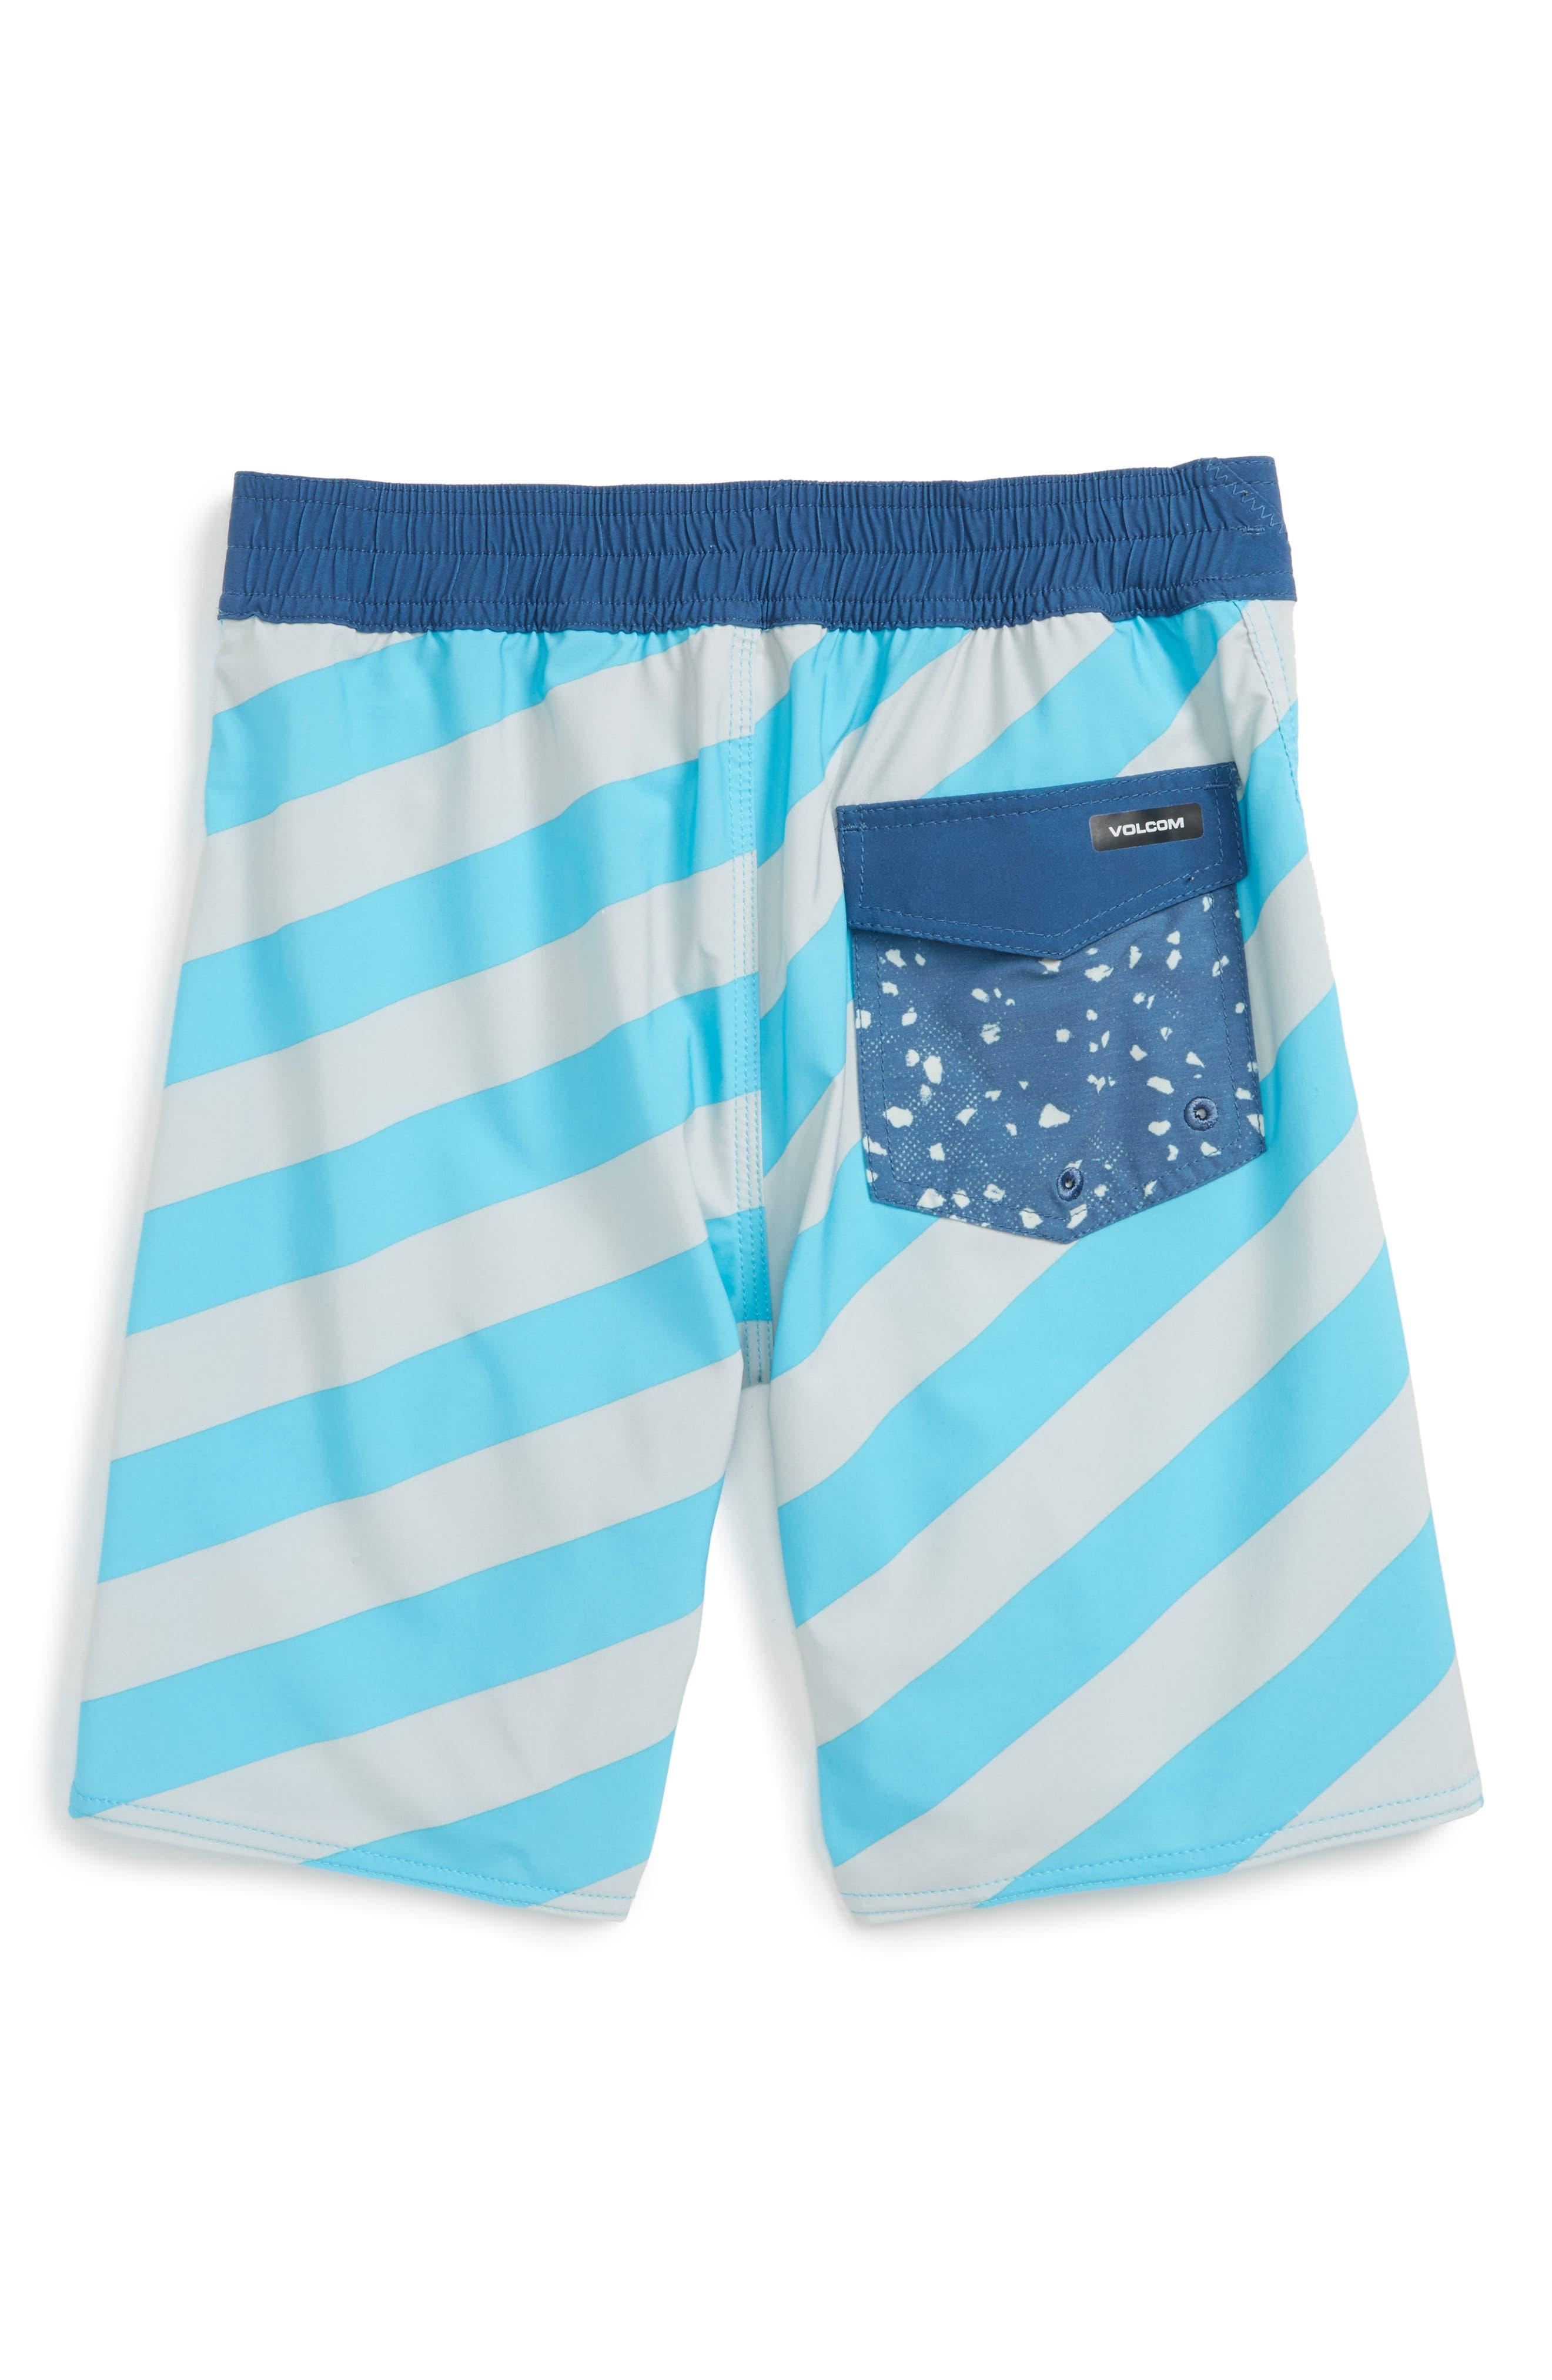 Stripey Jammer Board Shorts,                             Main thumbnail 6, color,